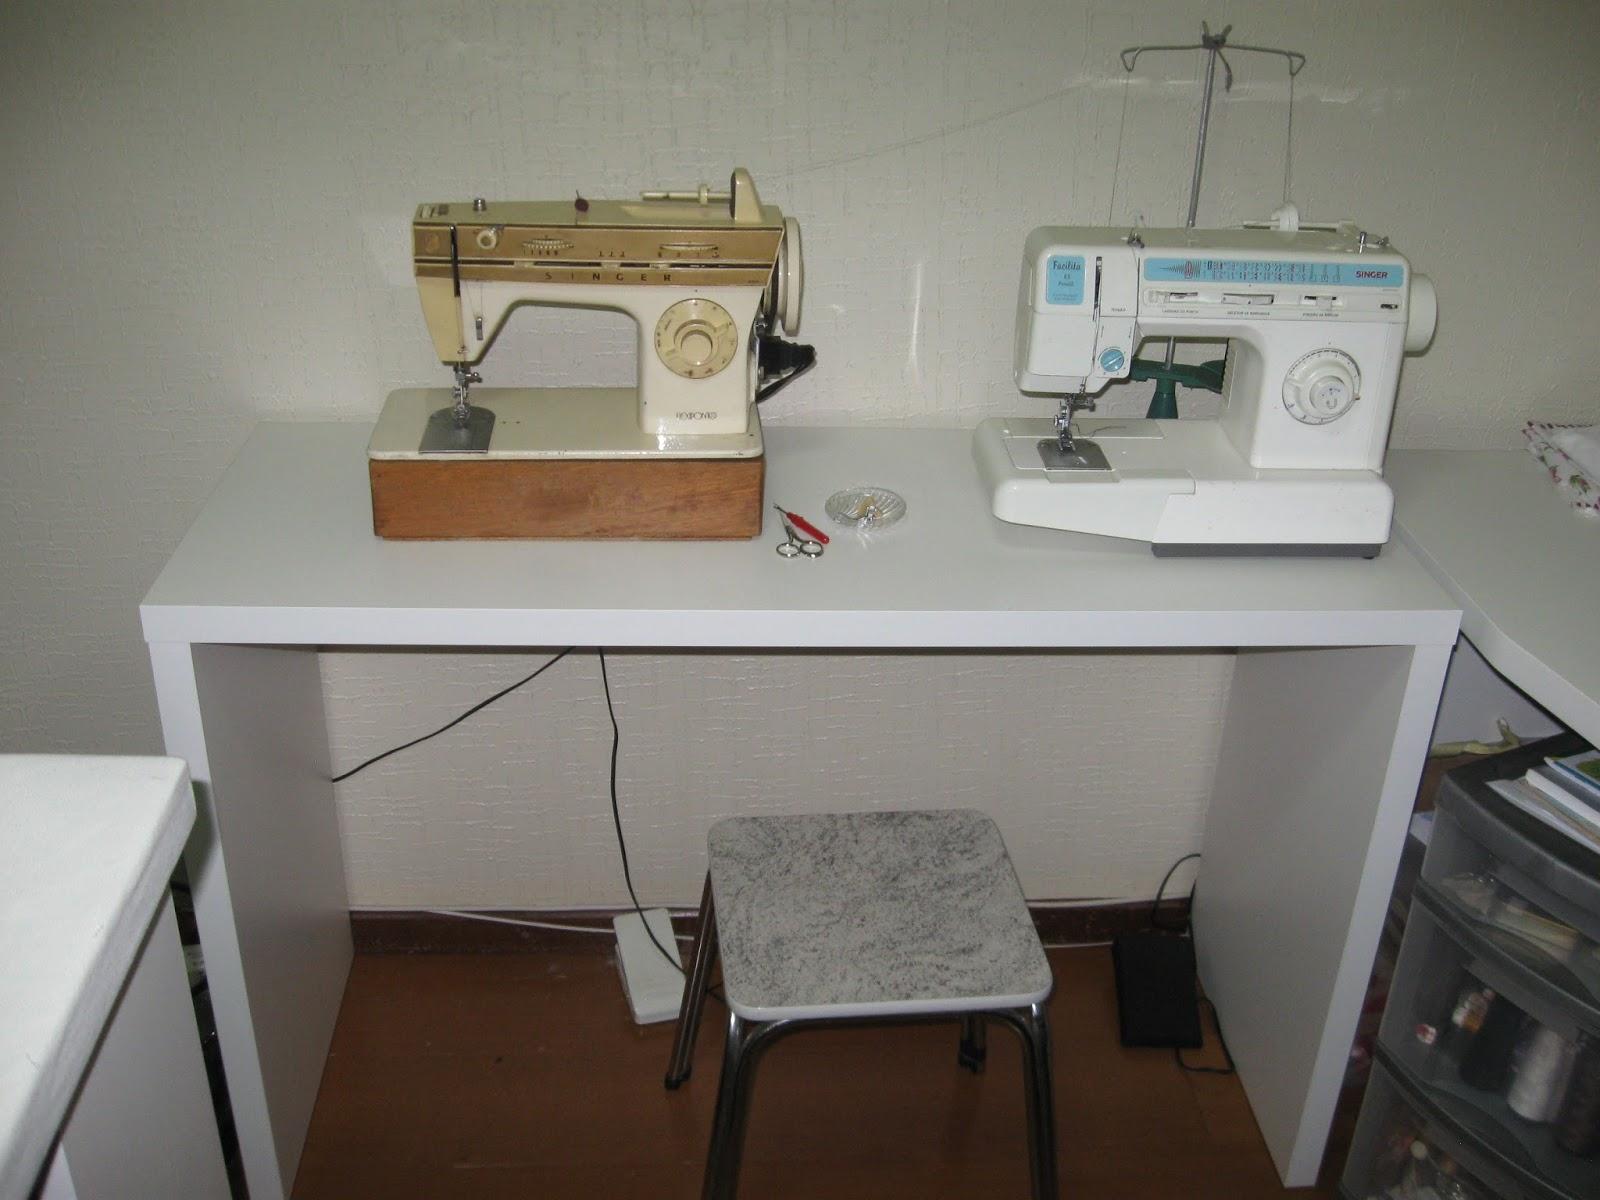 Luz weber meu atelier novo - Mesas para costura ...